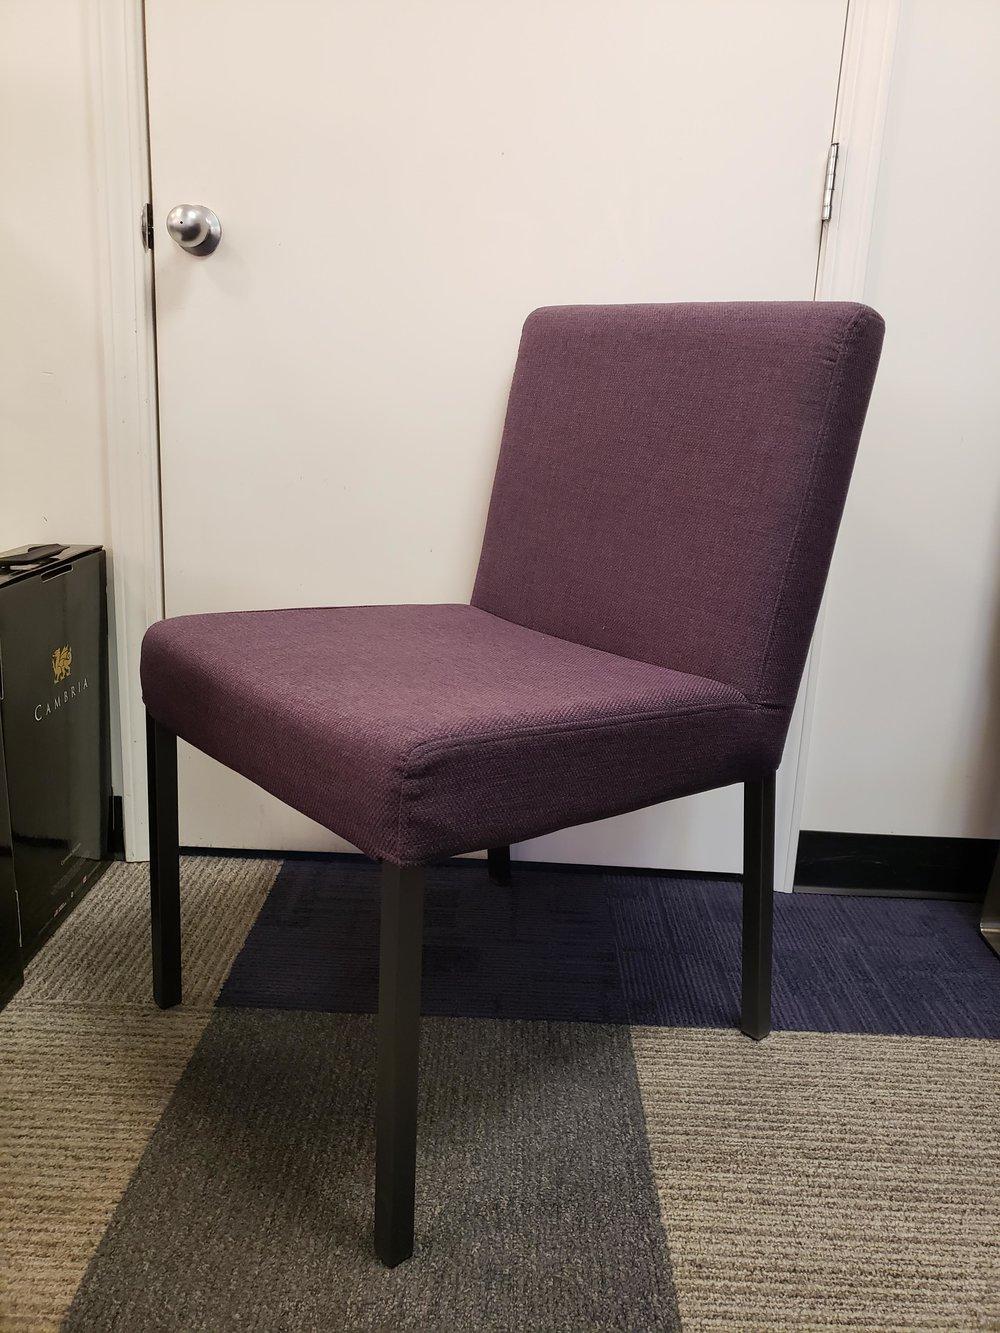 Mero Chair